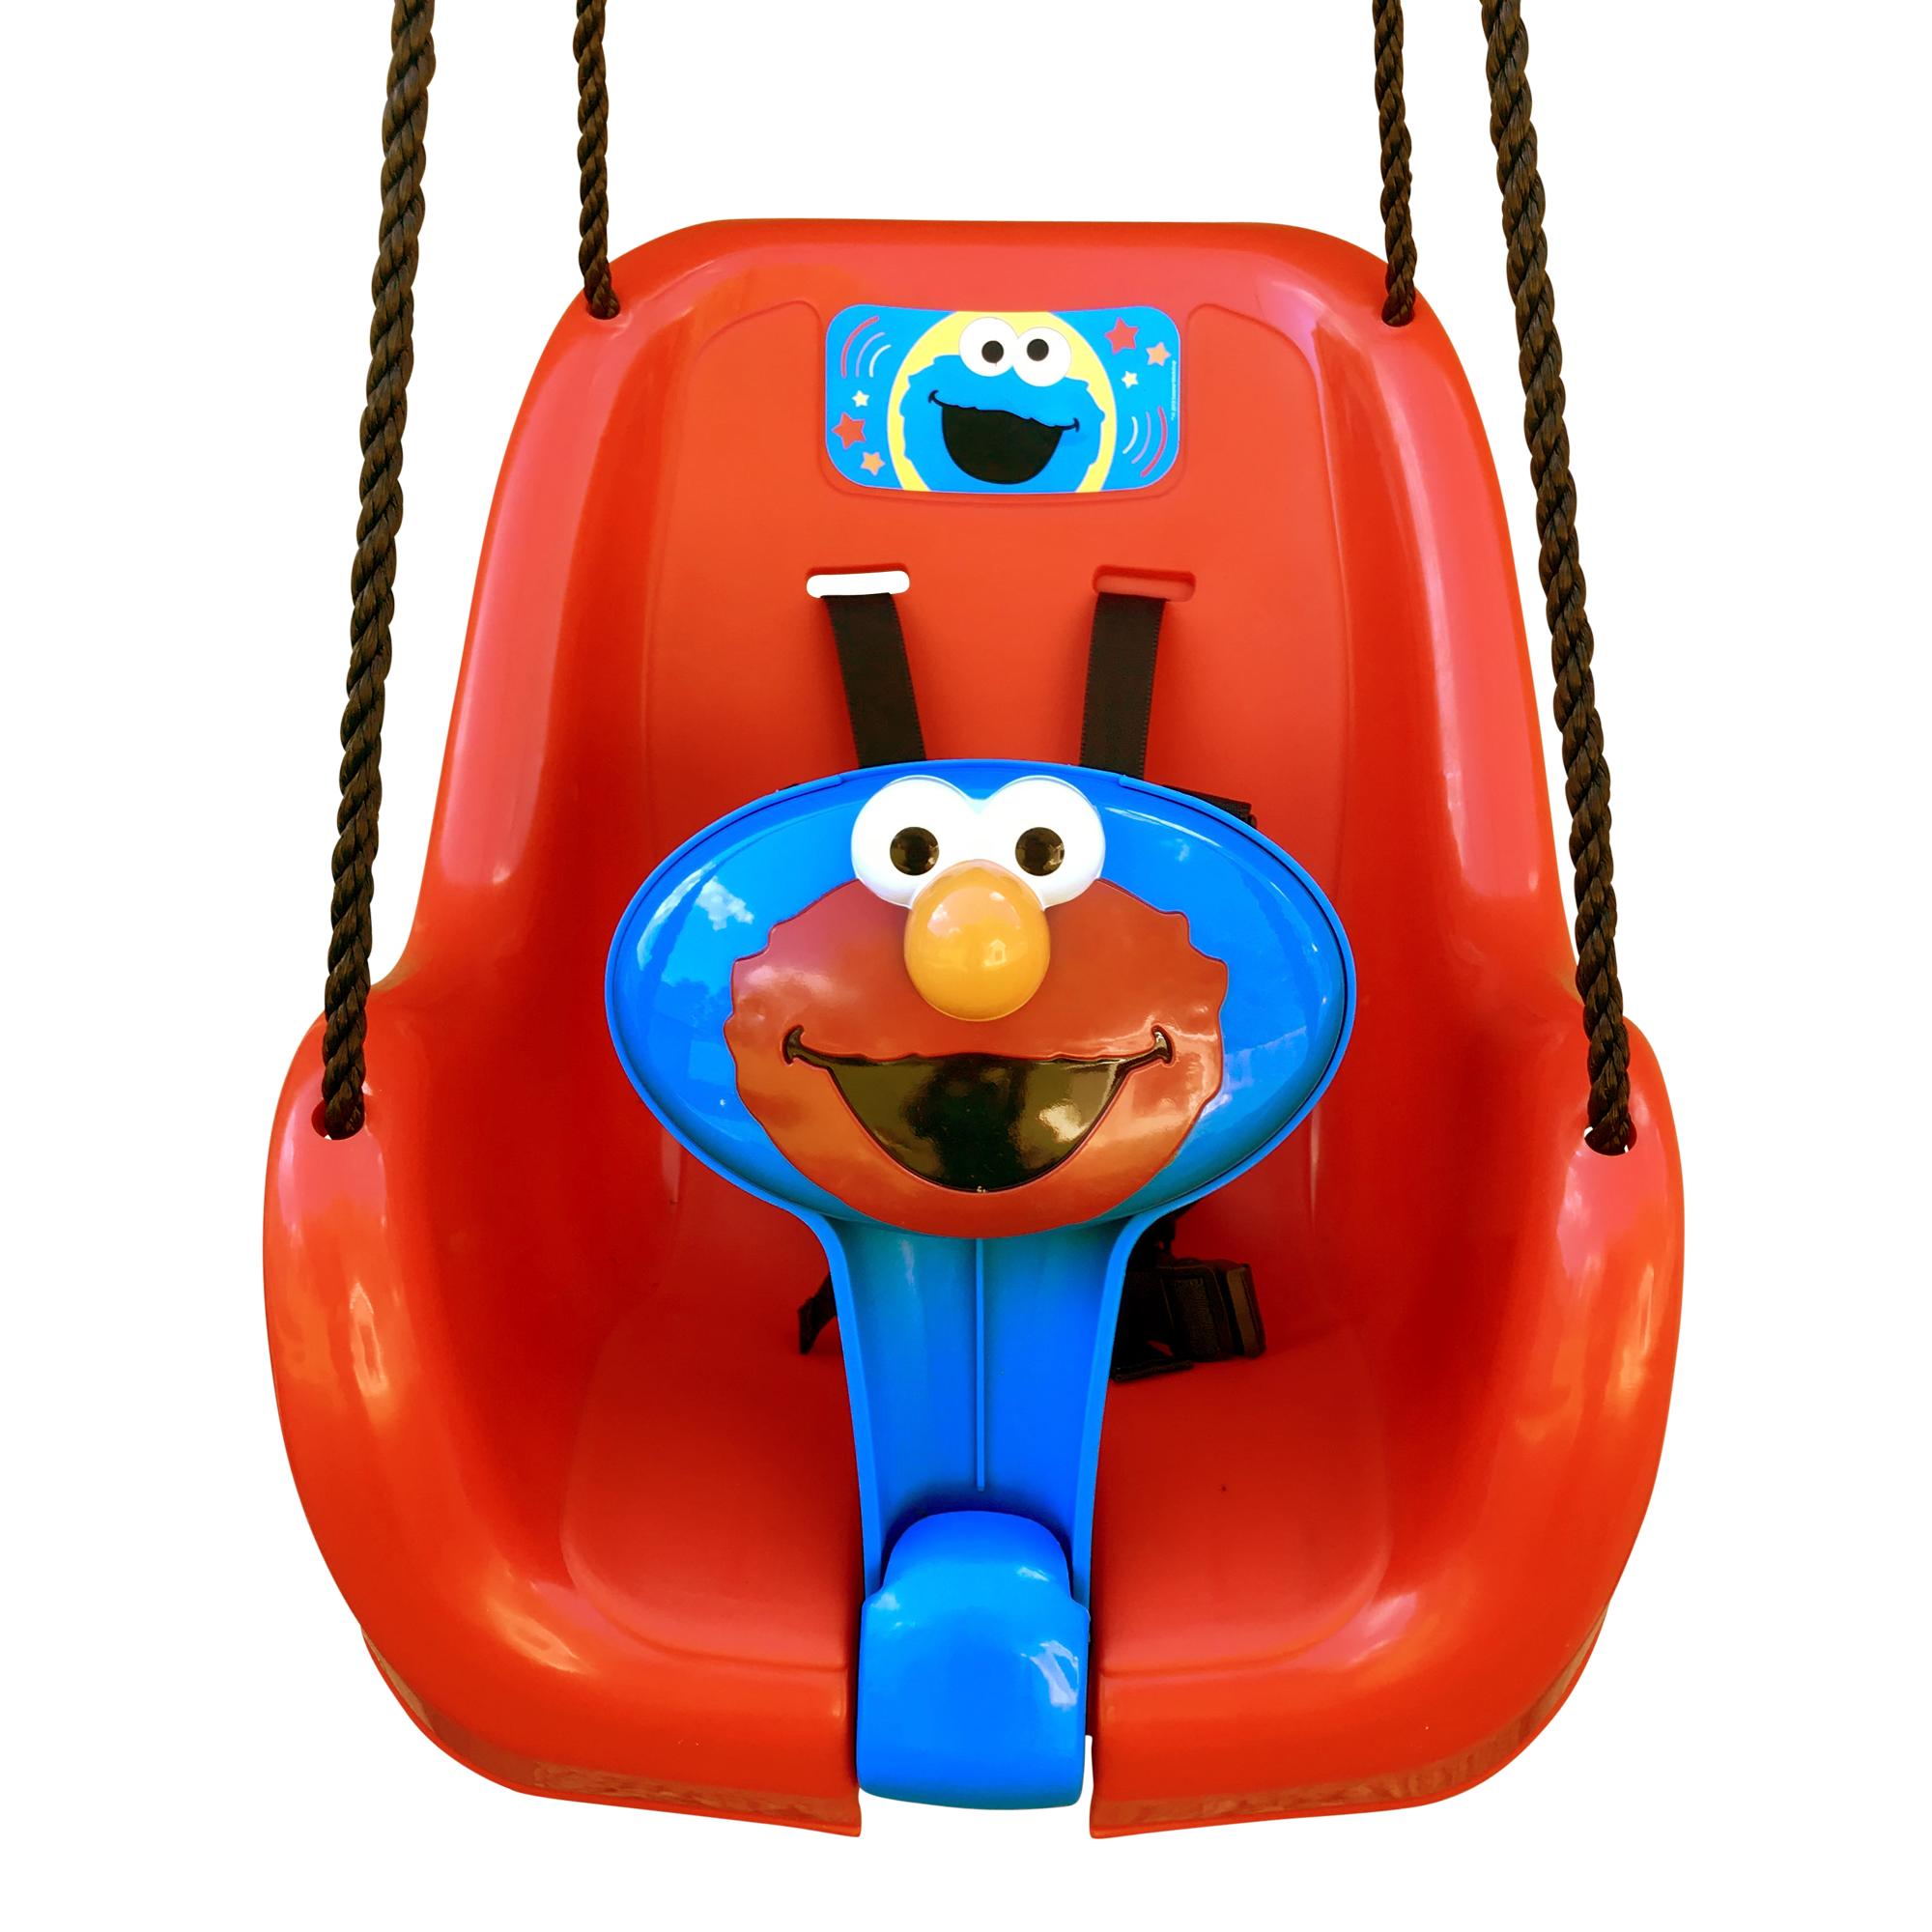 Sesame Street Elmo Toddler Swi...